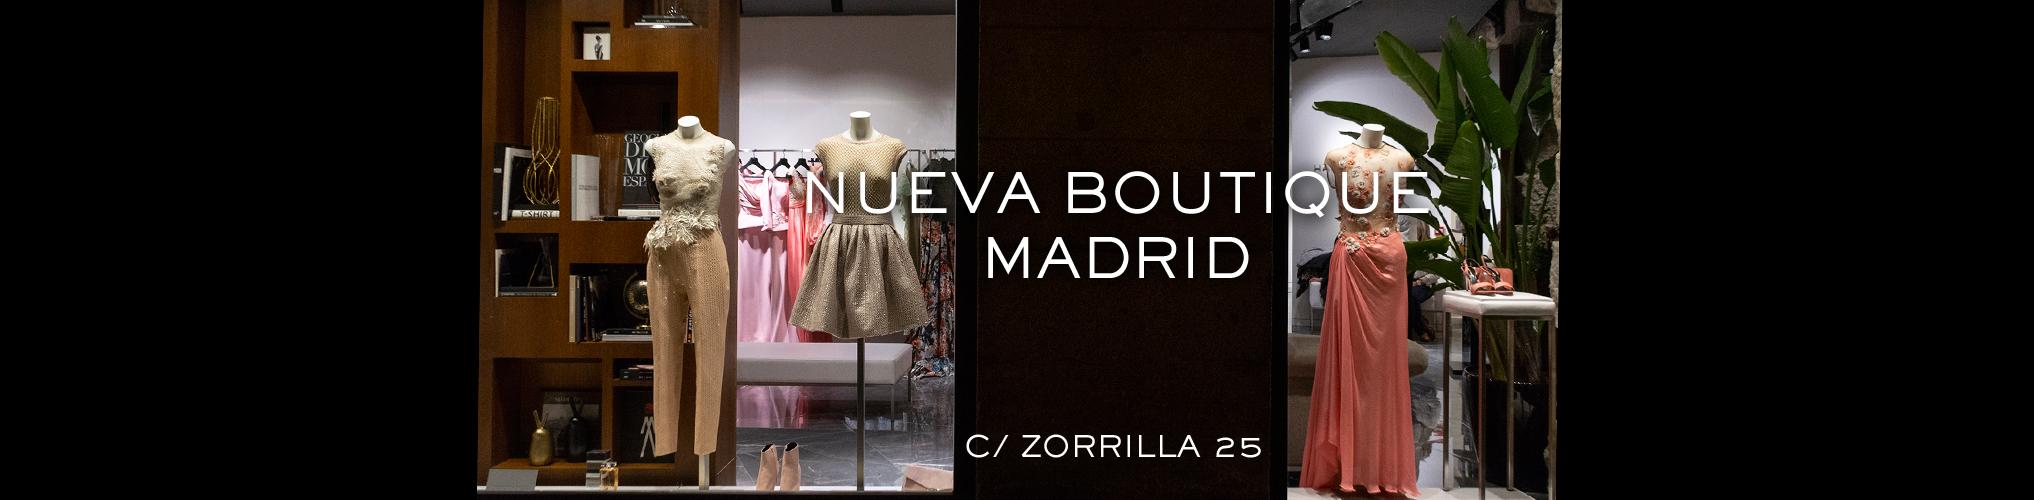 NUEVA BOUTIQUE MADRID